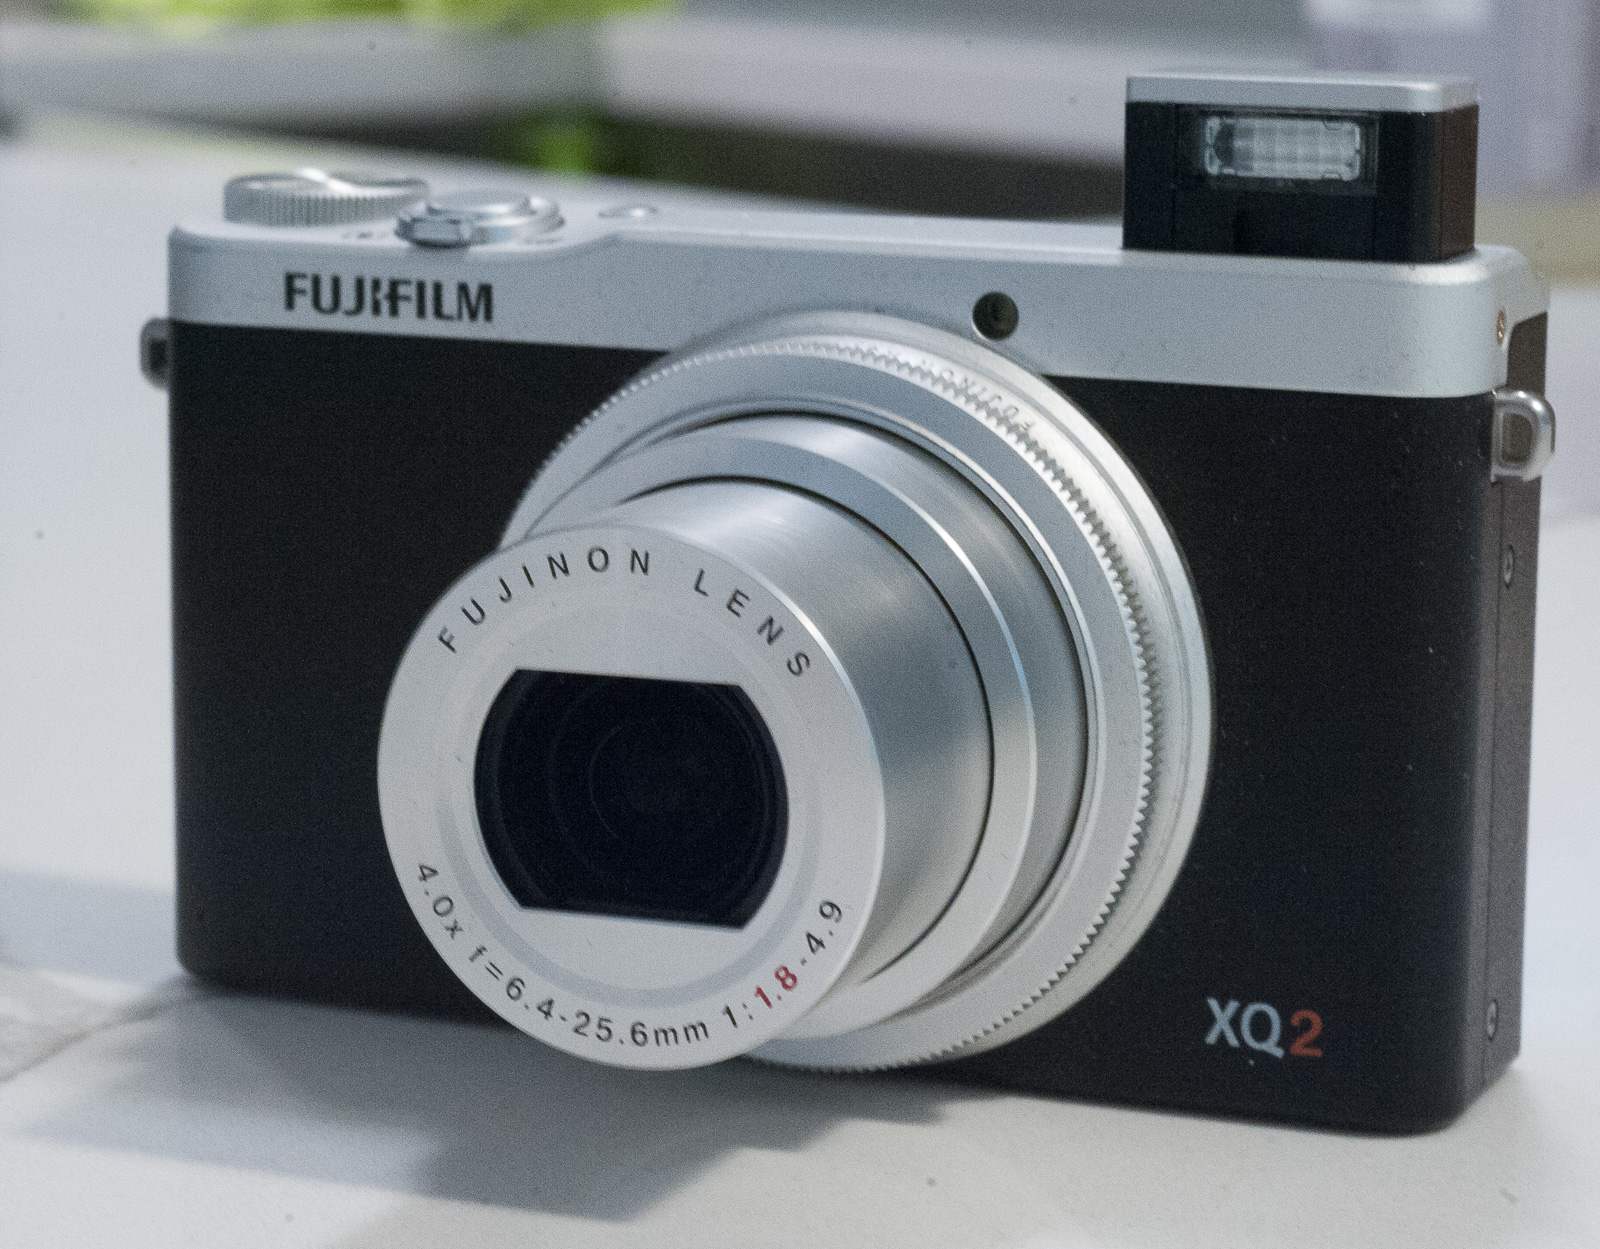 Serounder Portable Lens Adapter Ring,Metal Manual Focus Camera Lens Mount Adapter Ring for FD Lens to for NEX Mirrorless Camera